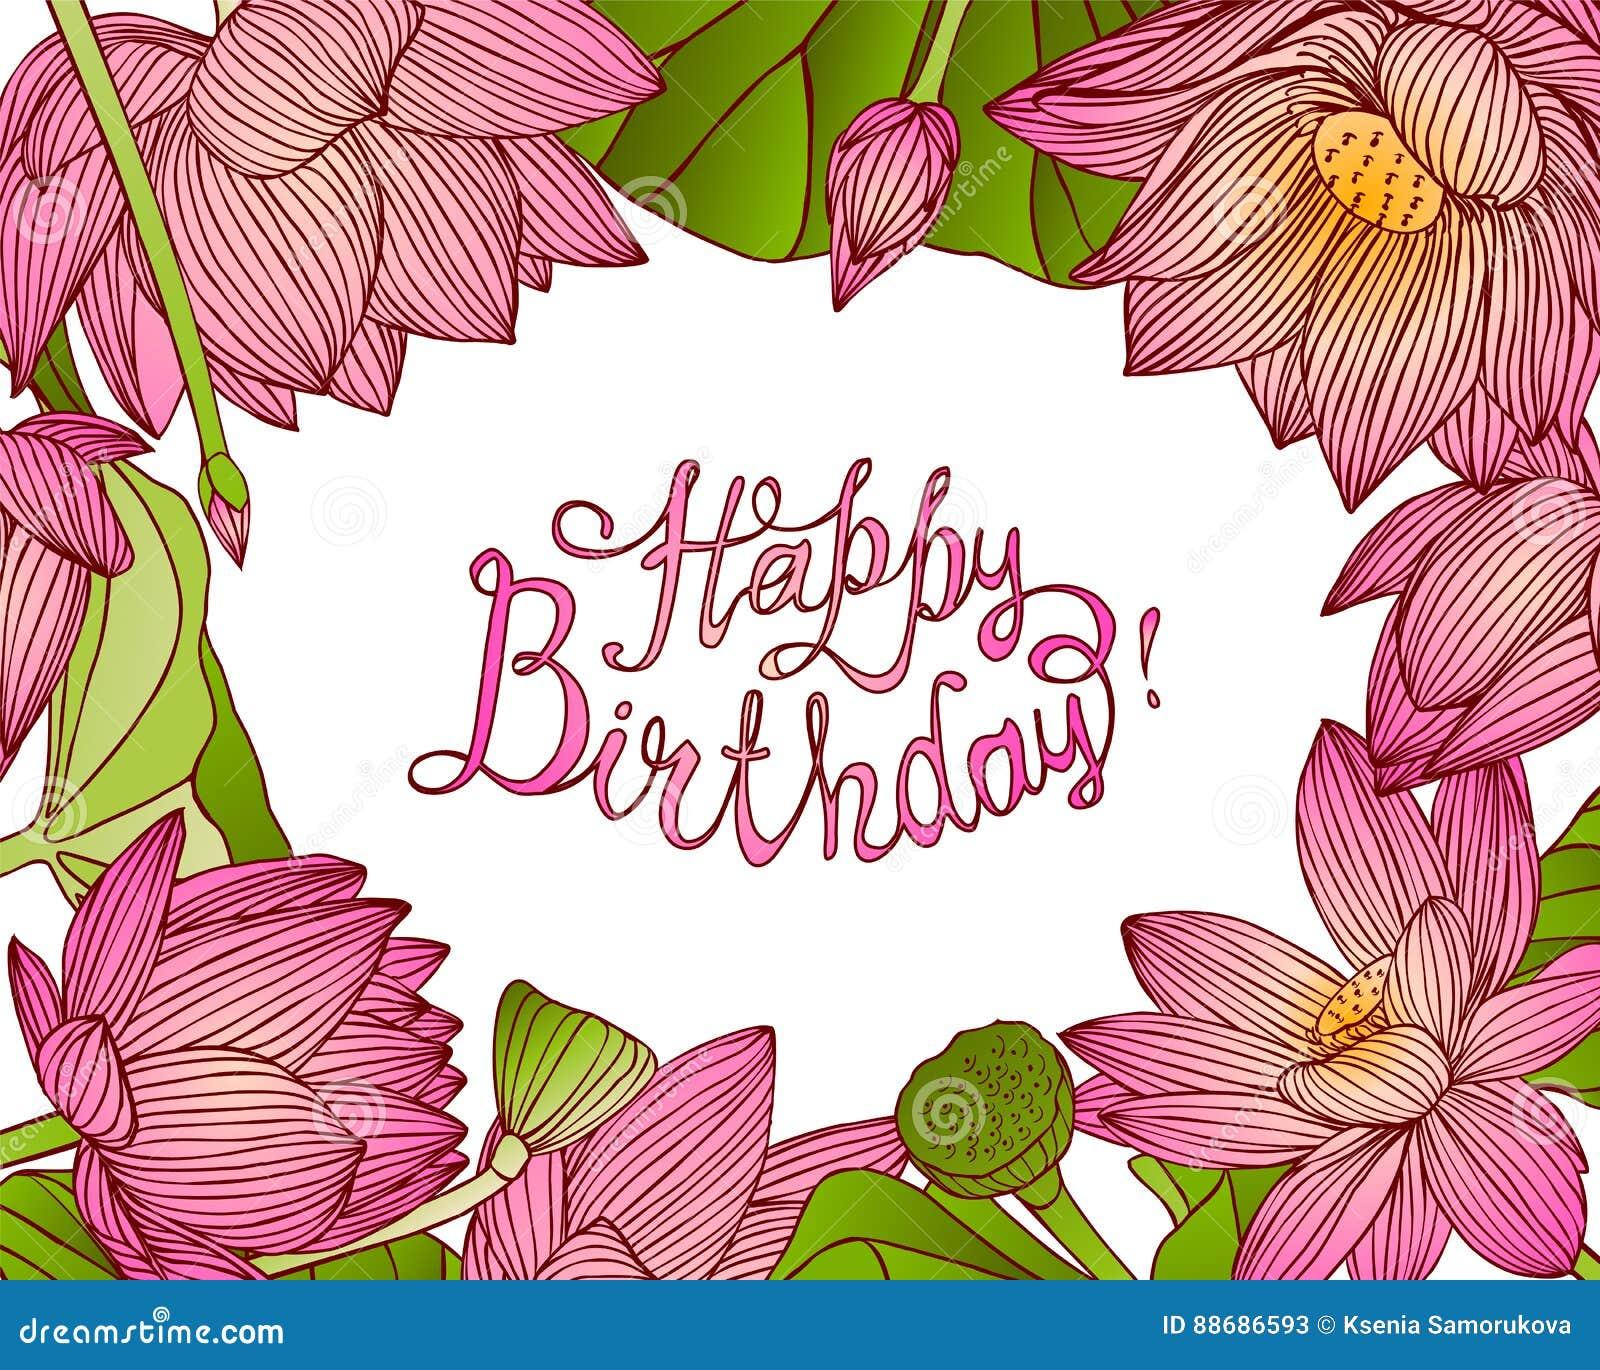 Happy birthday vector card with lotus flowers stock vector happy birthday vector card with lotus flowers izmirmasajfo